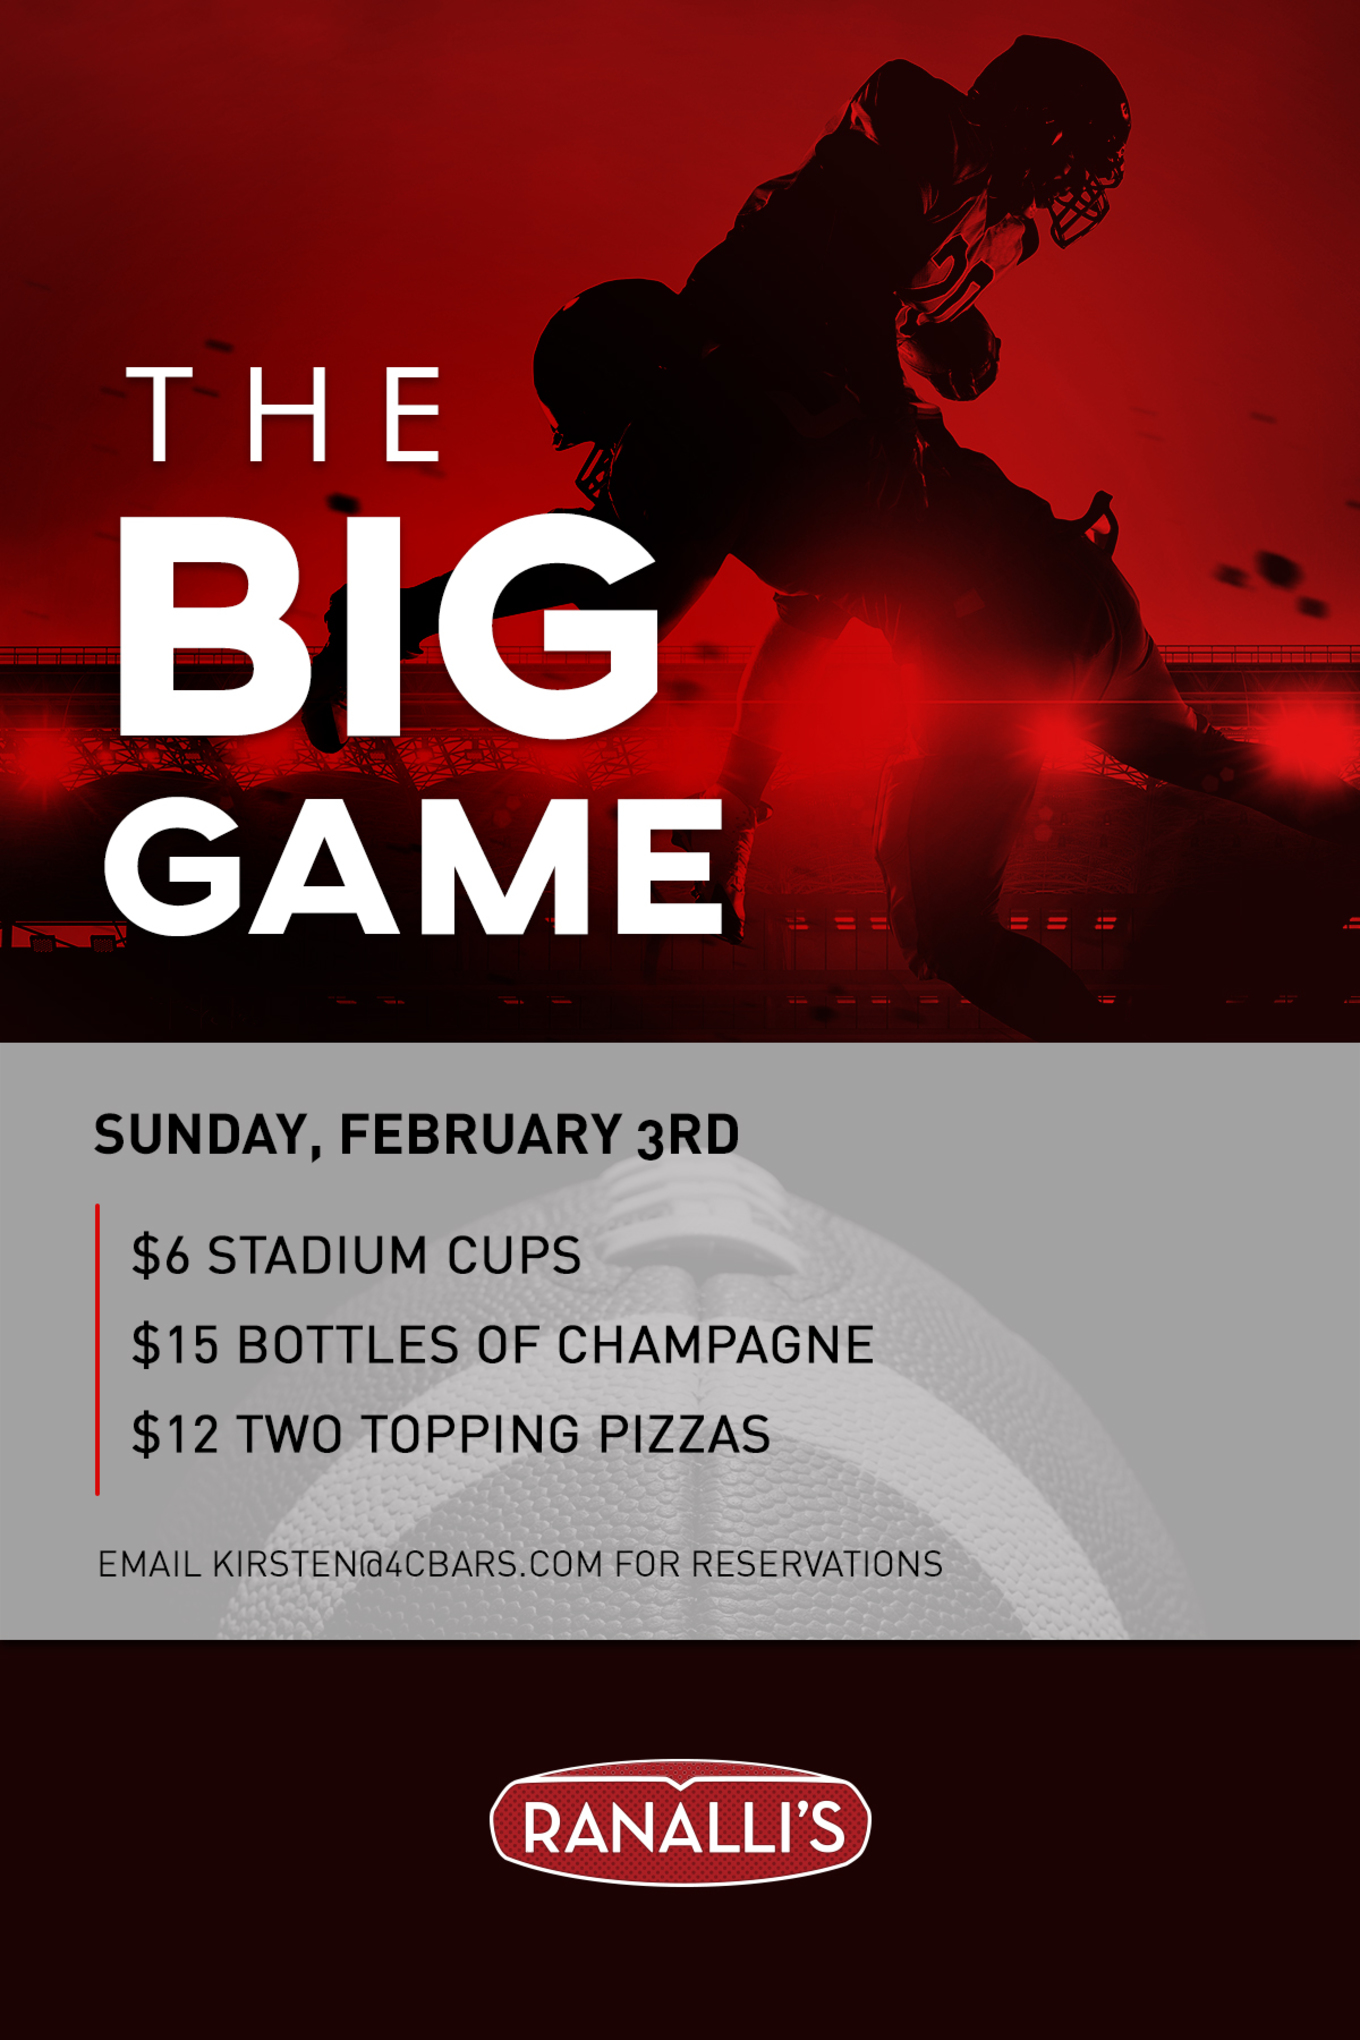 The Big Game at Ranalli's